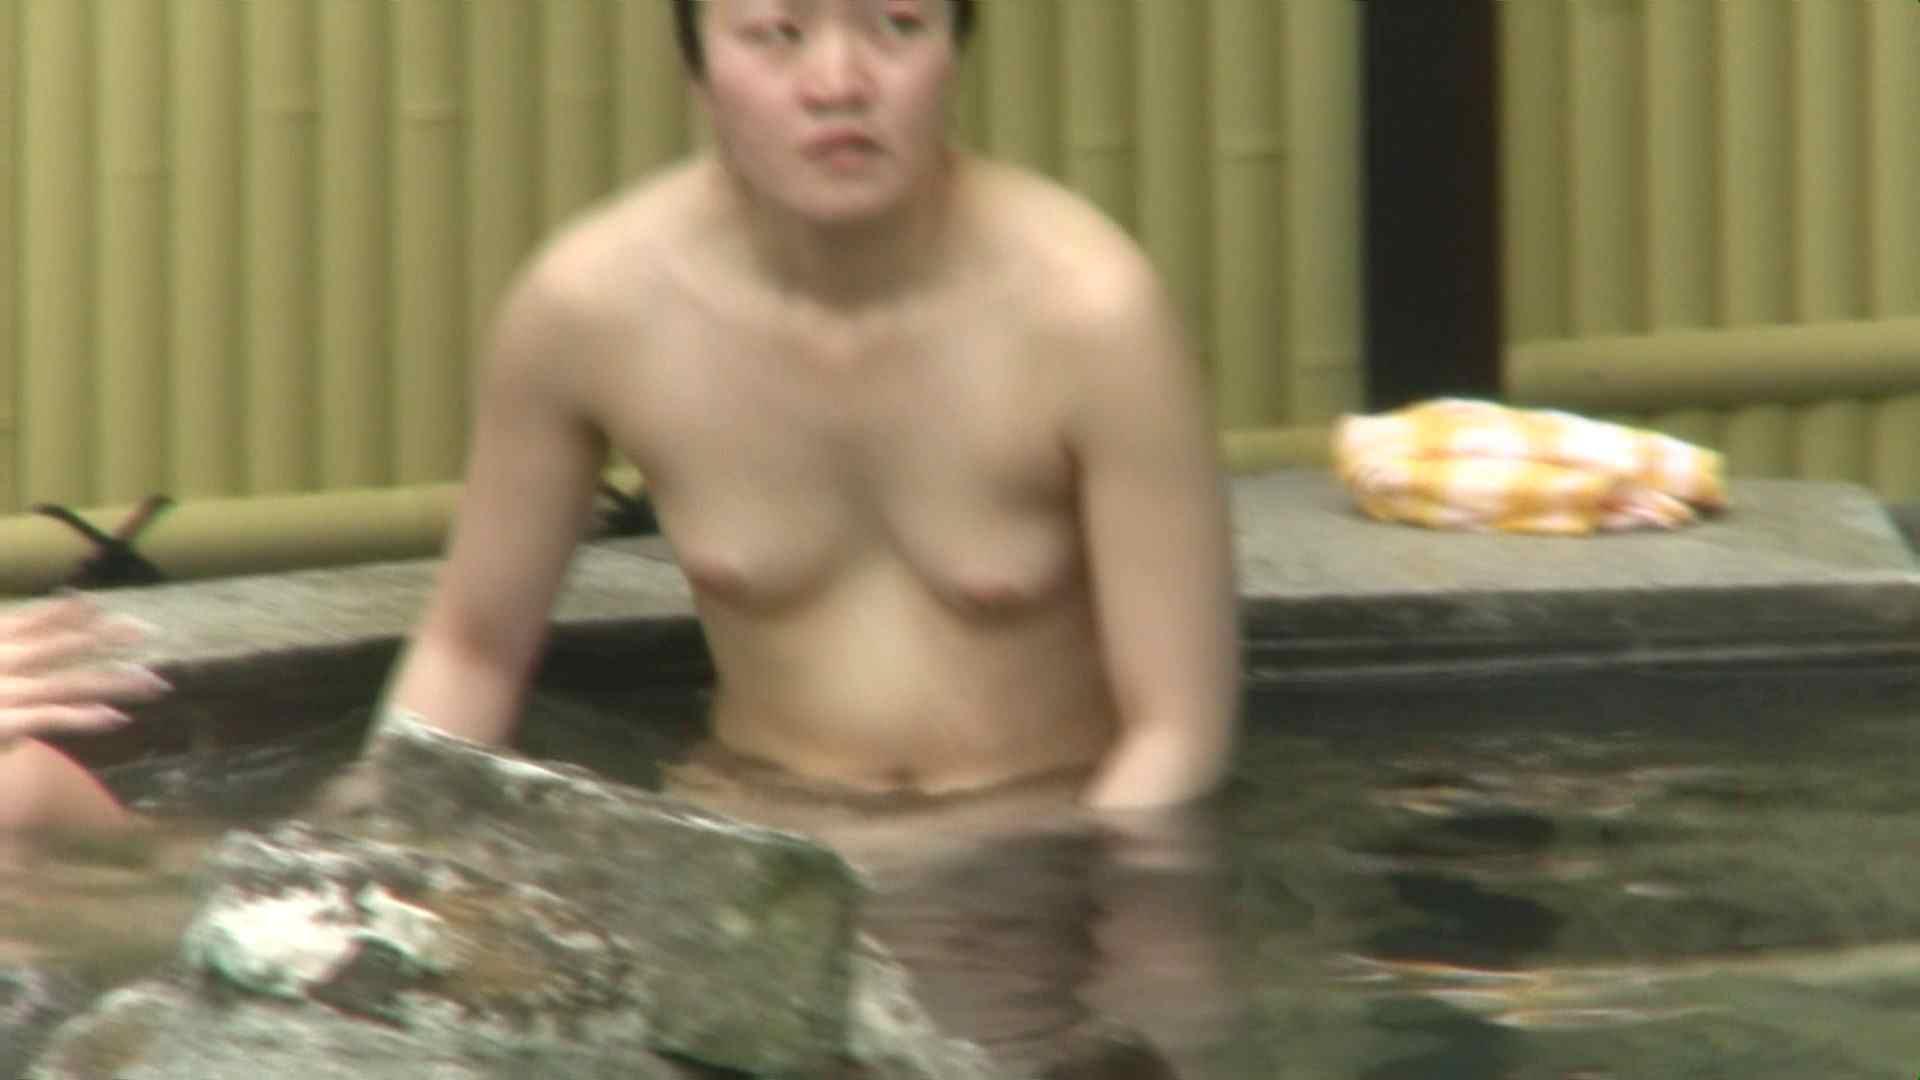 Aquaな露天風呂Vol.66【VIP限定】 盗撮師作品  83pic 69